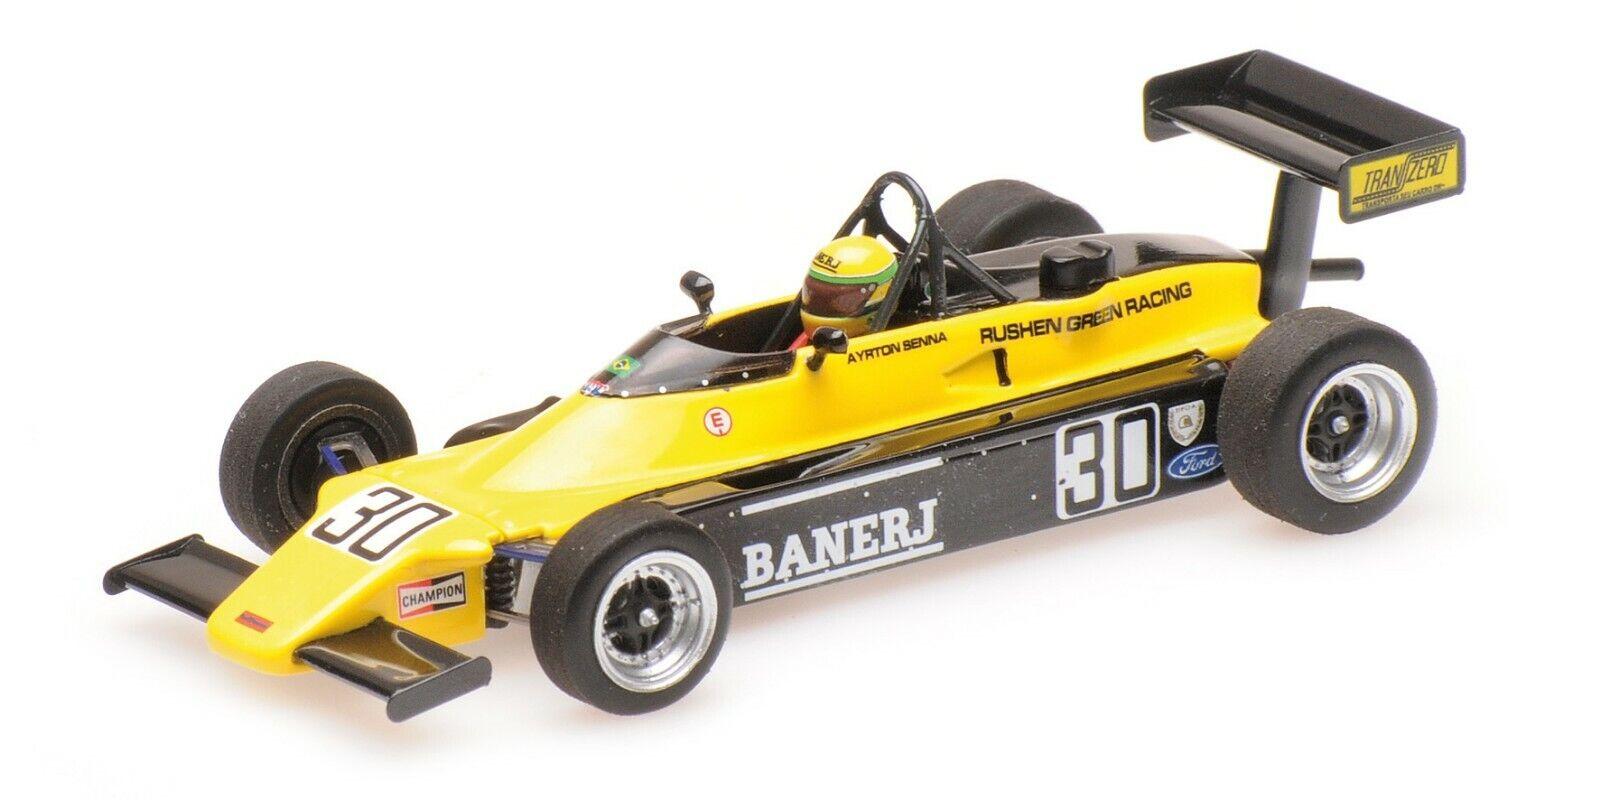 ordenar ahora Minichamps F1 Van Van Van Diemen RF82 Ayrton Senna 1 43 Champion Rd. 8 Jyllandsring 1982  marca famosa